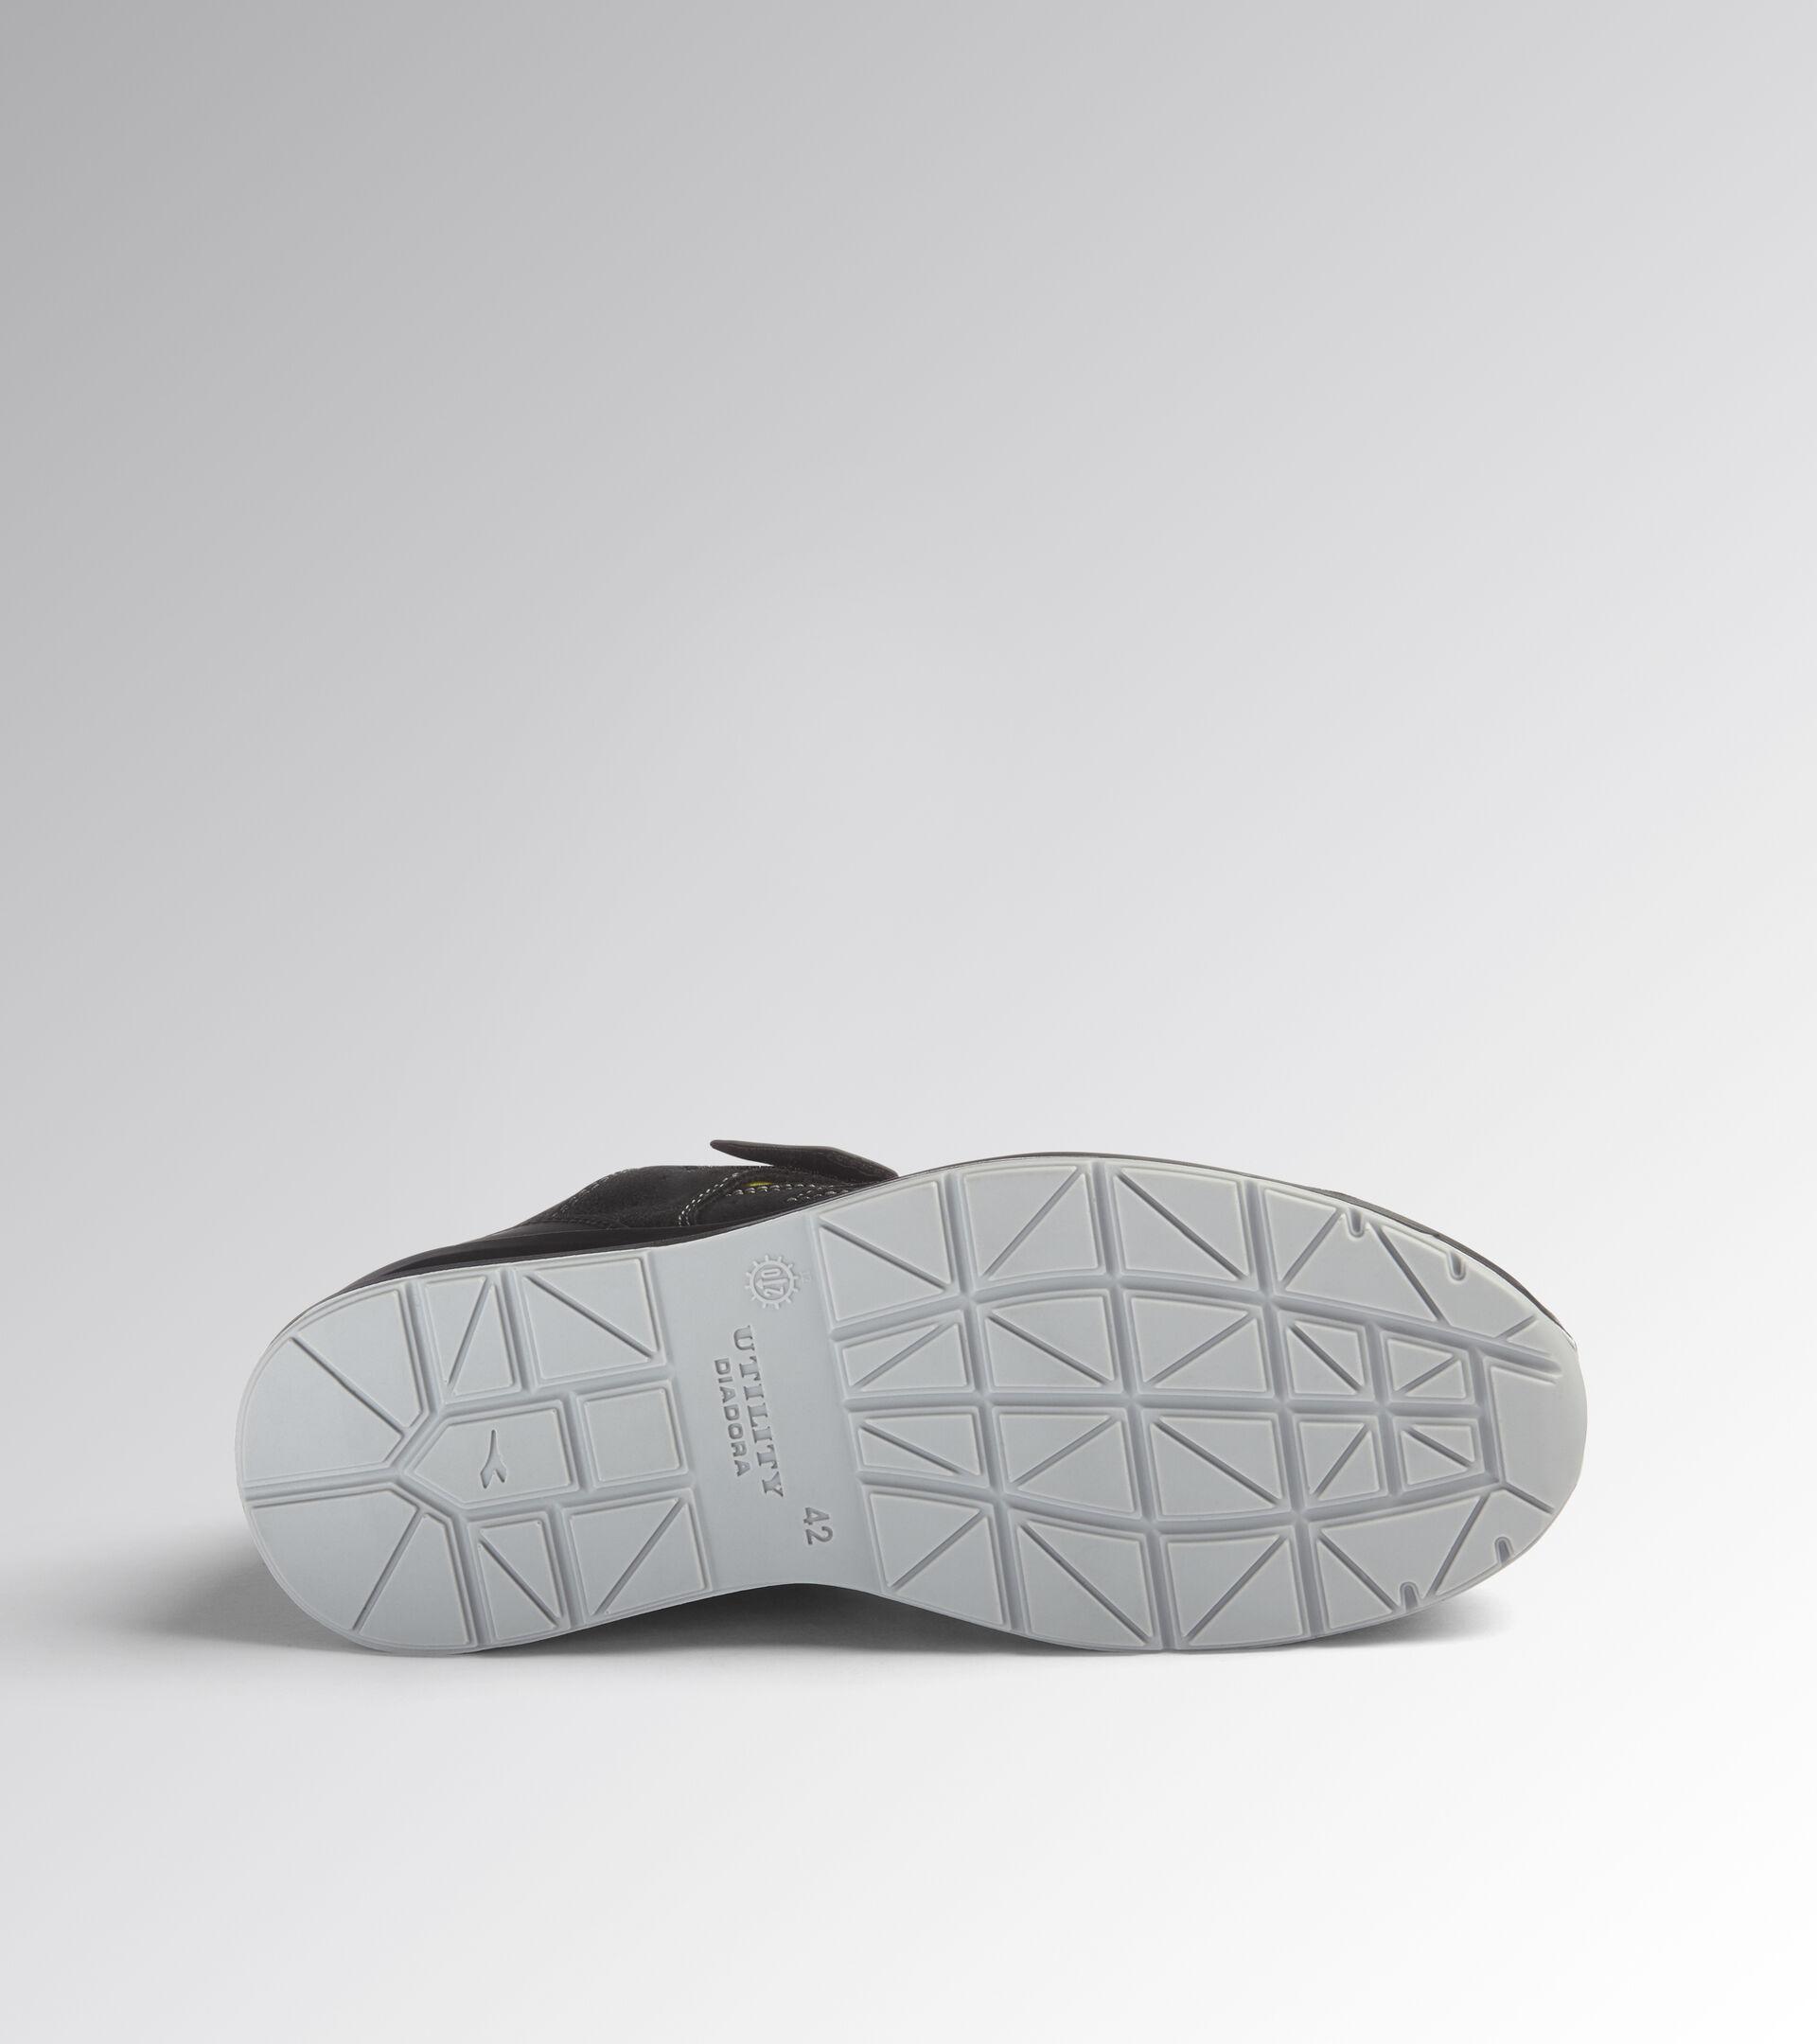 Footwear Utility UNISEX RUN NET AIRBOX SANDAL S1P SRC BLACK/ANTHRACITE Utility